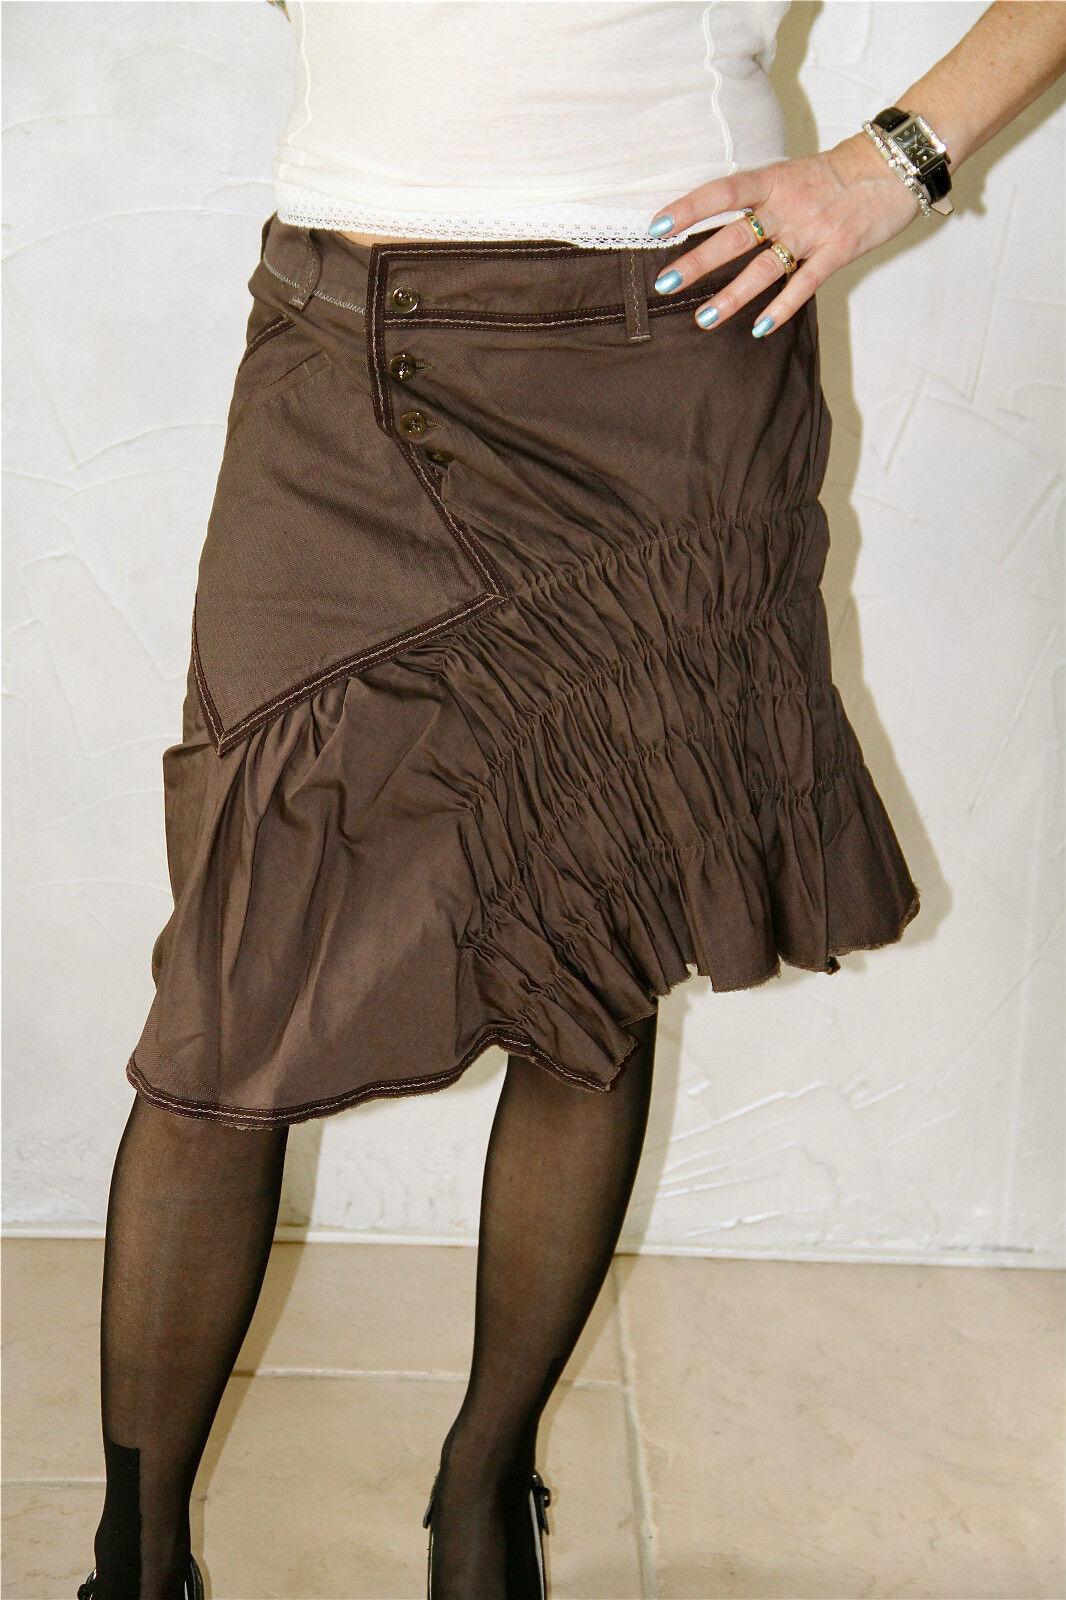 Skirt braun Cotton Linen Printed Marithé François Girbaud S NEW Größe Label